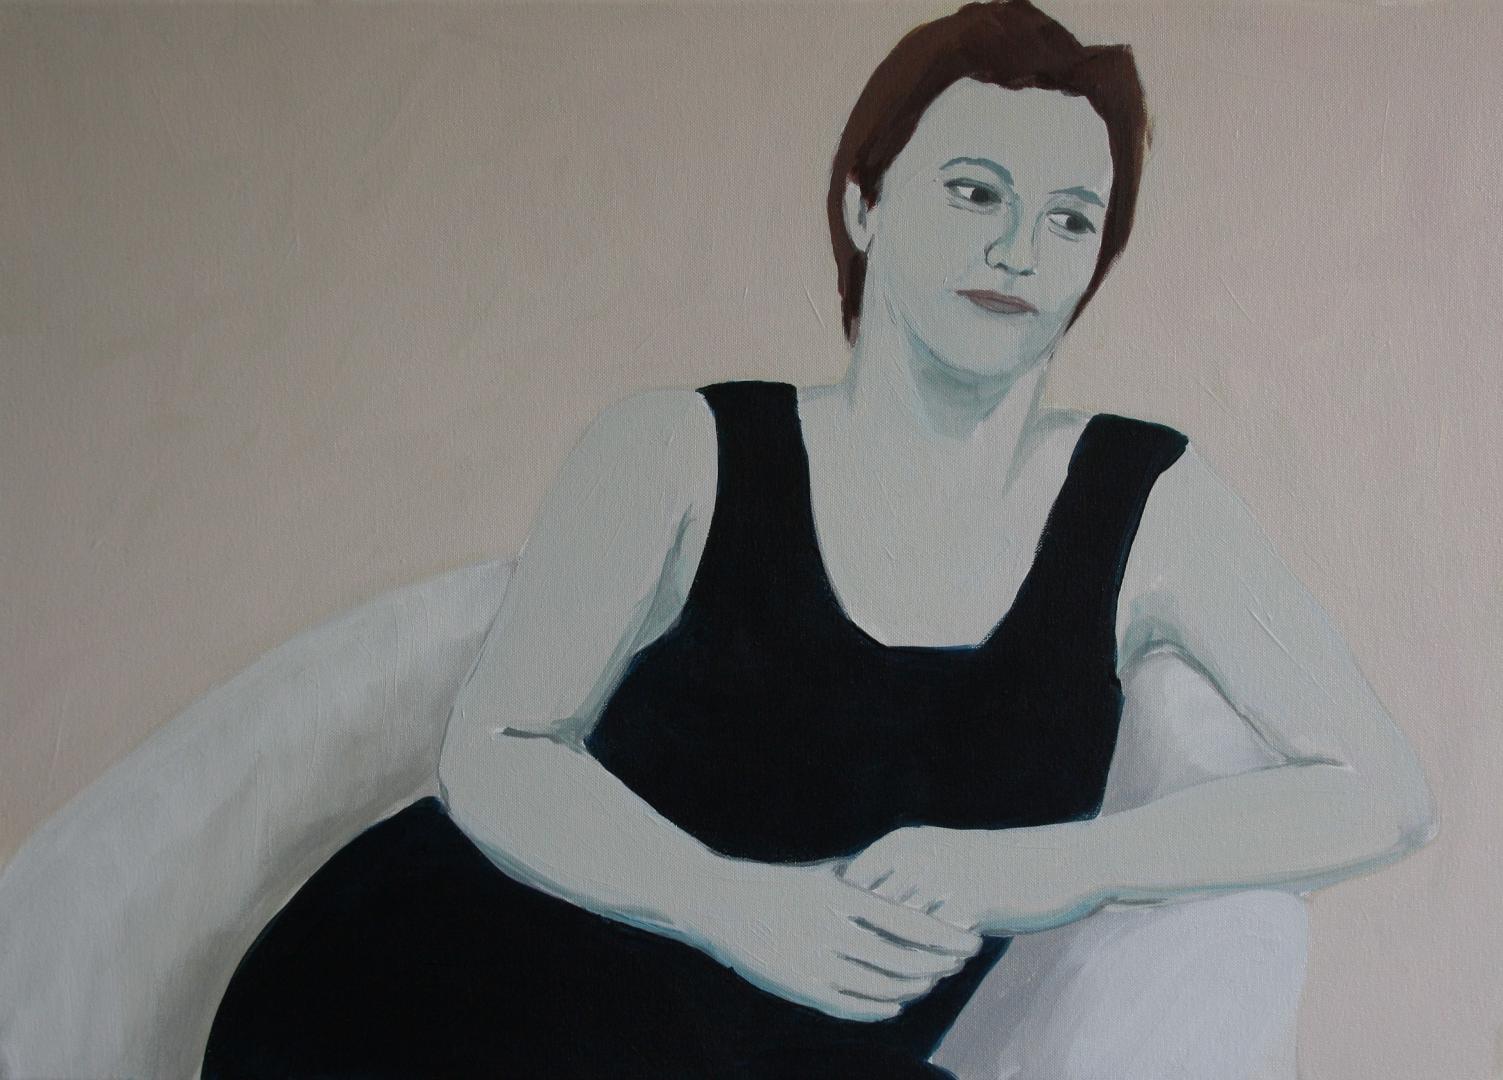 Ohne Titel, Acryl auf Leinwand, 70x50cm